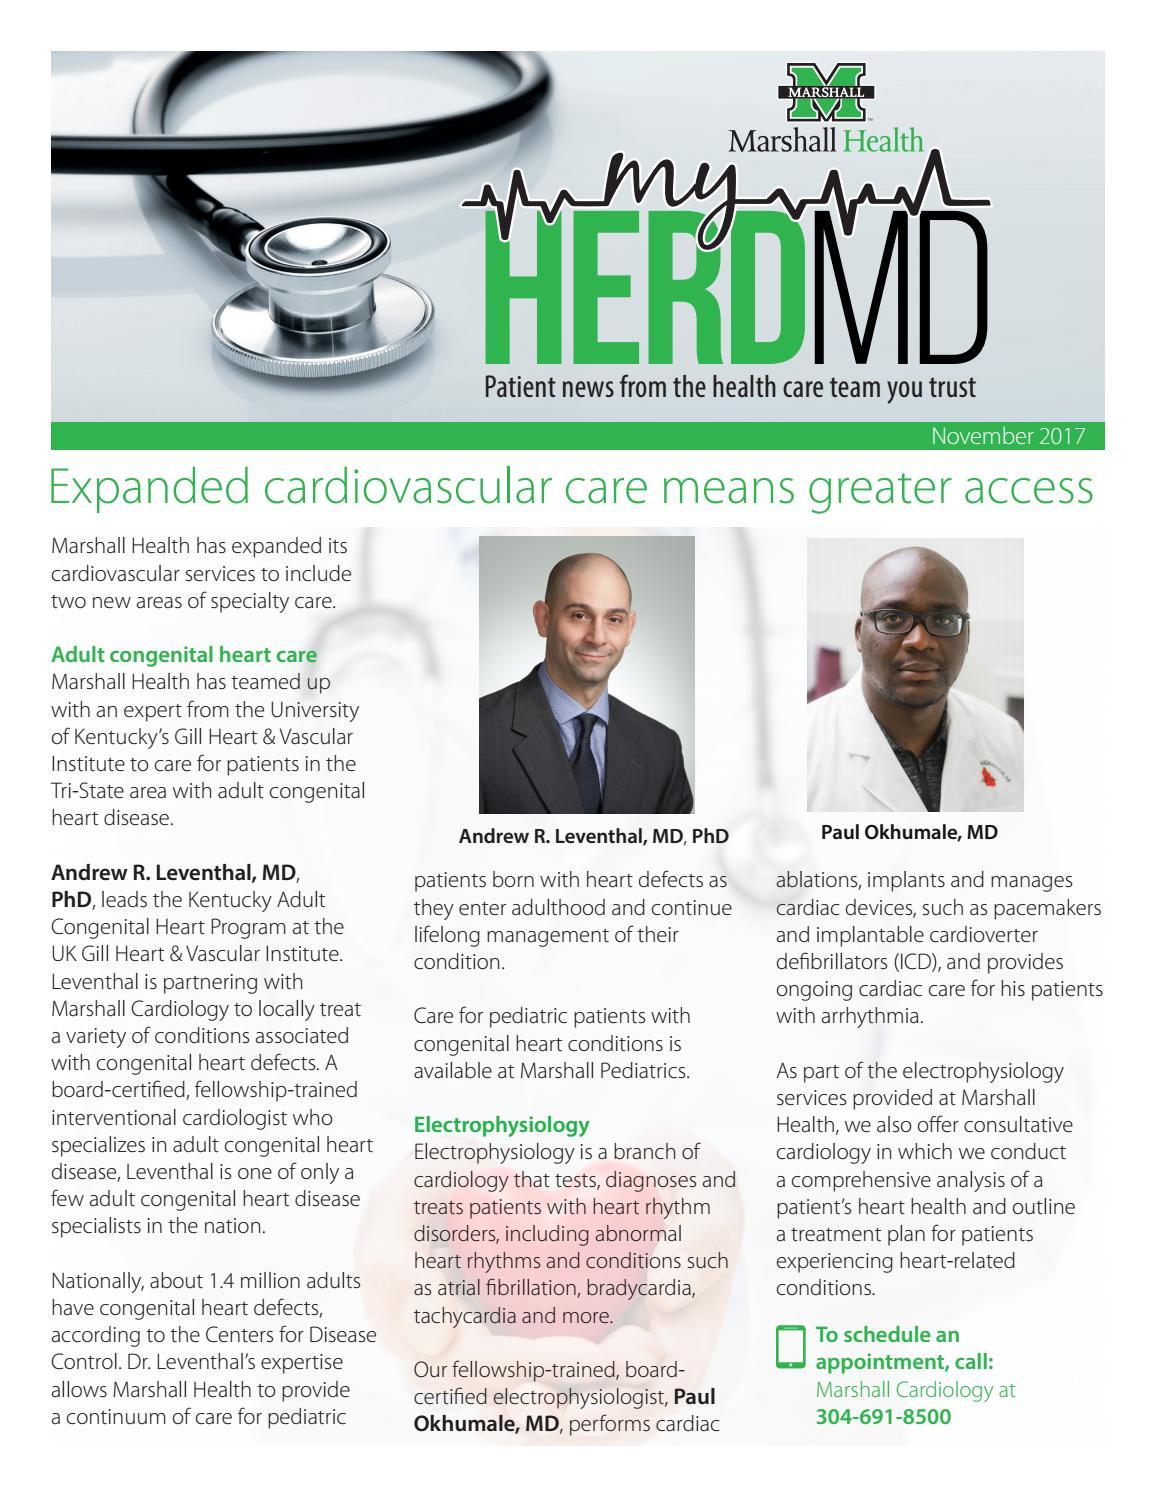 MyHerdMD - November 2017 by Marshall Health - issuu